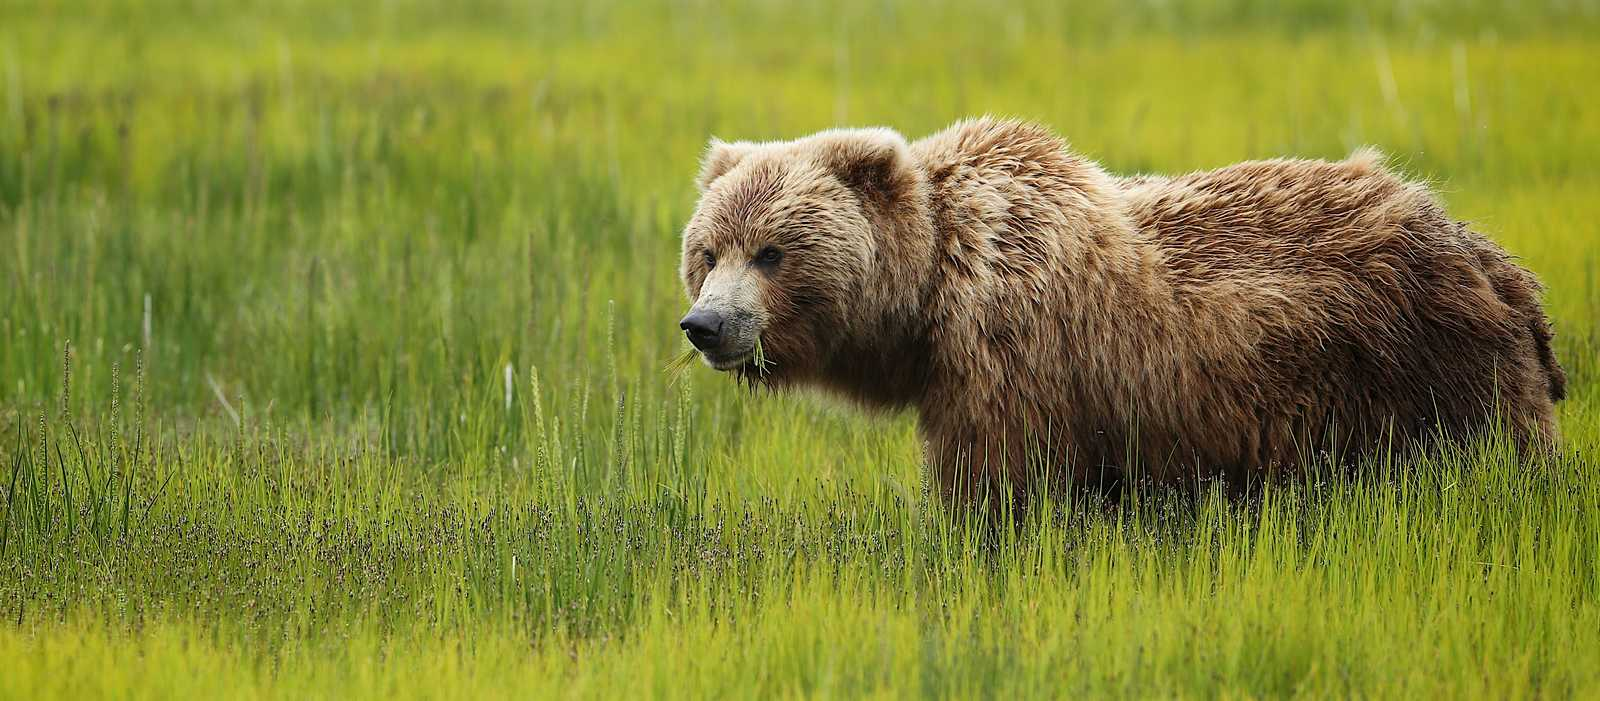 Bärenbeobachtung im Kenai Fjords National Park